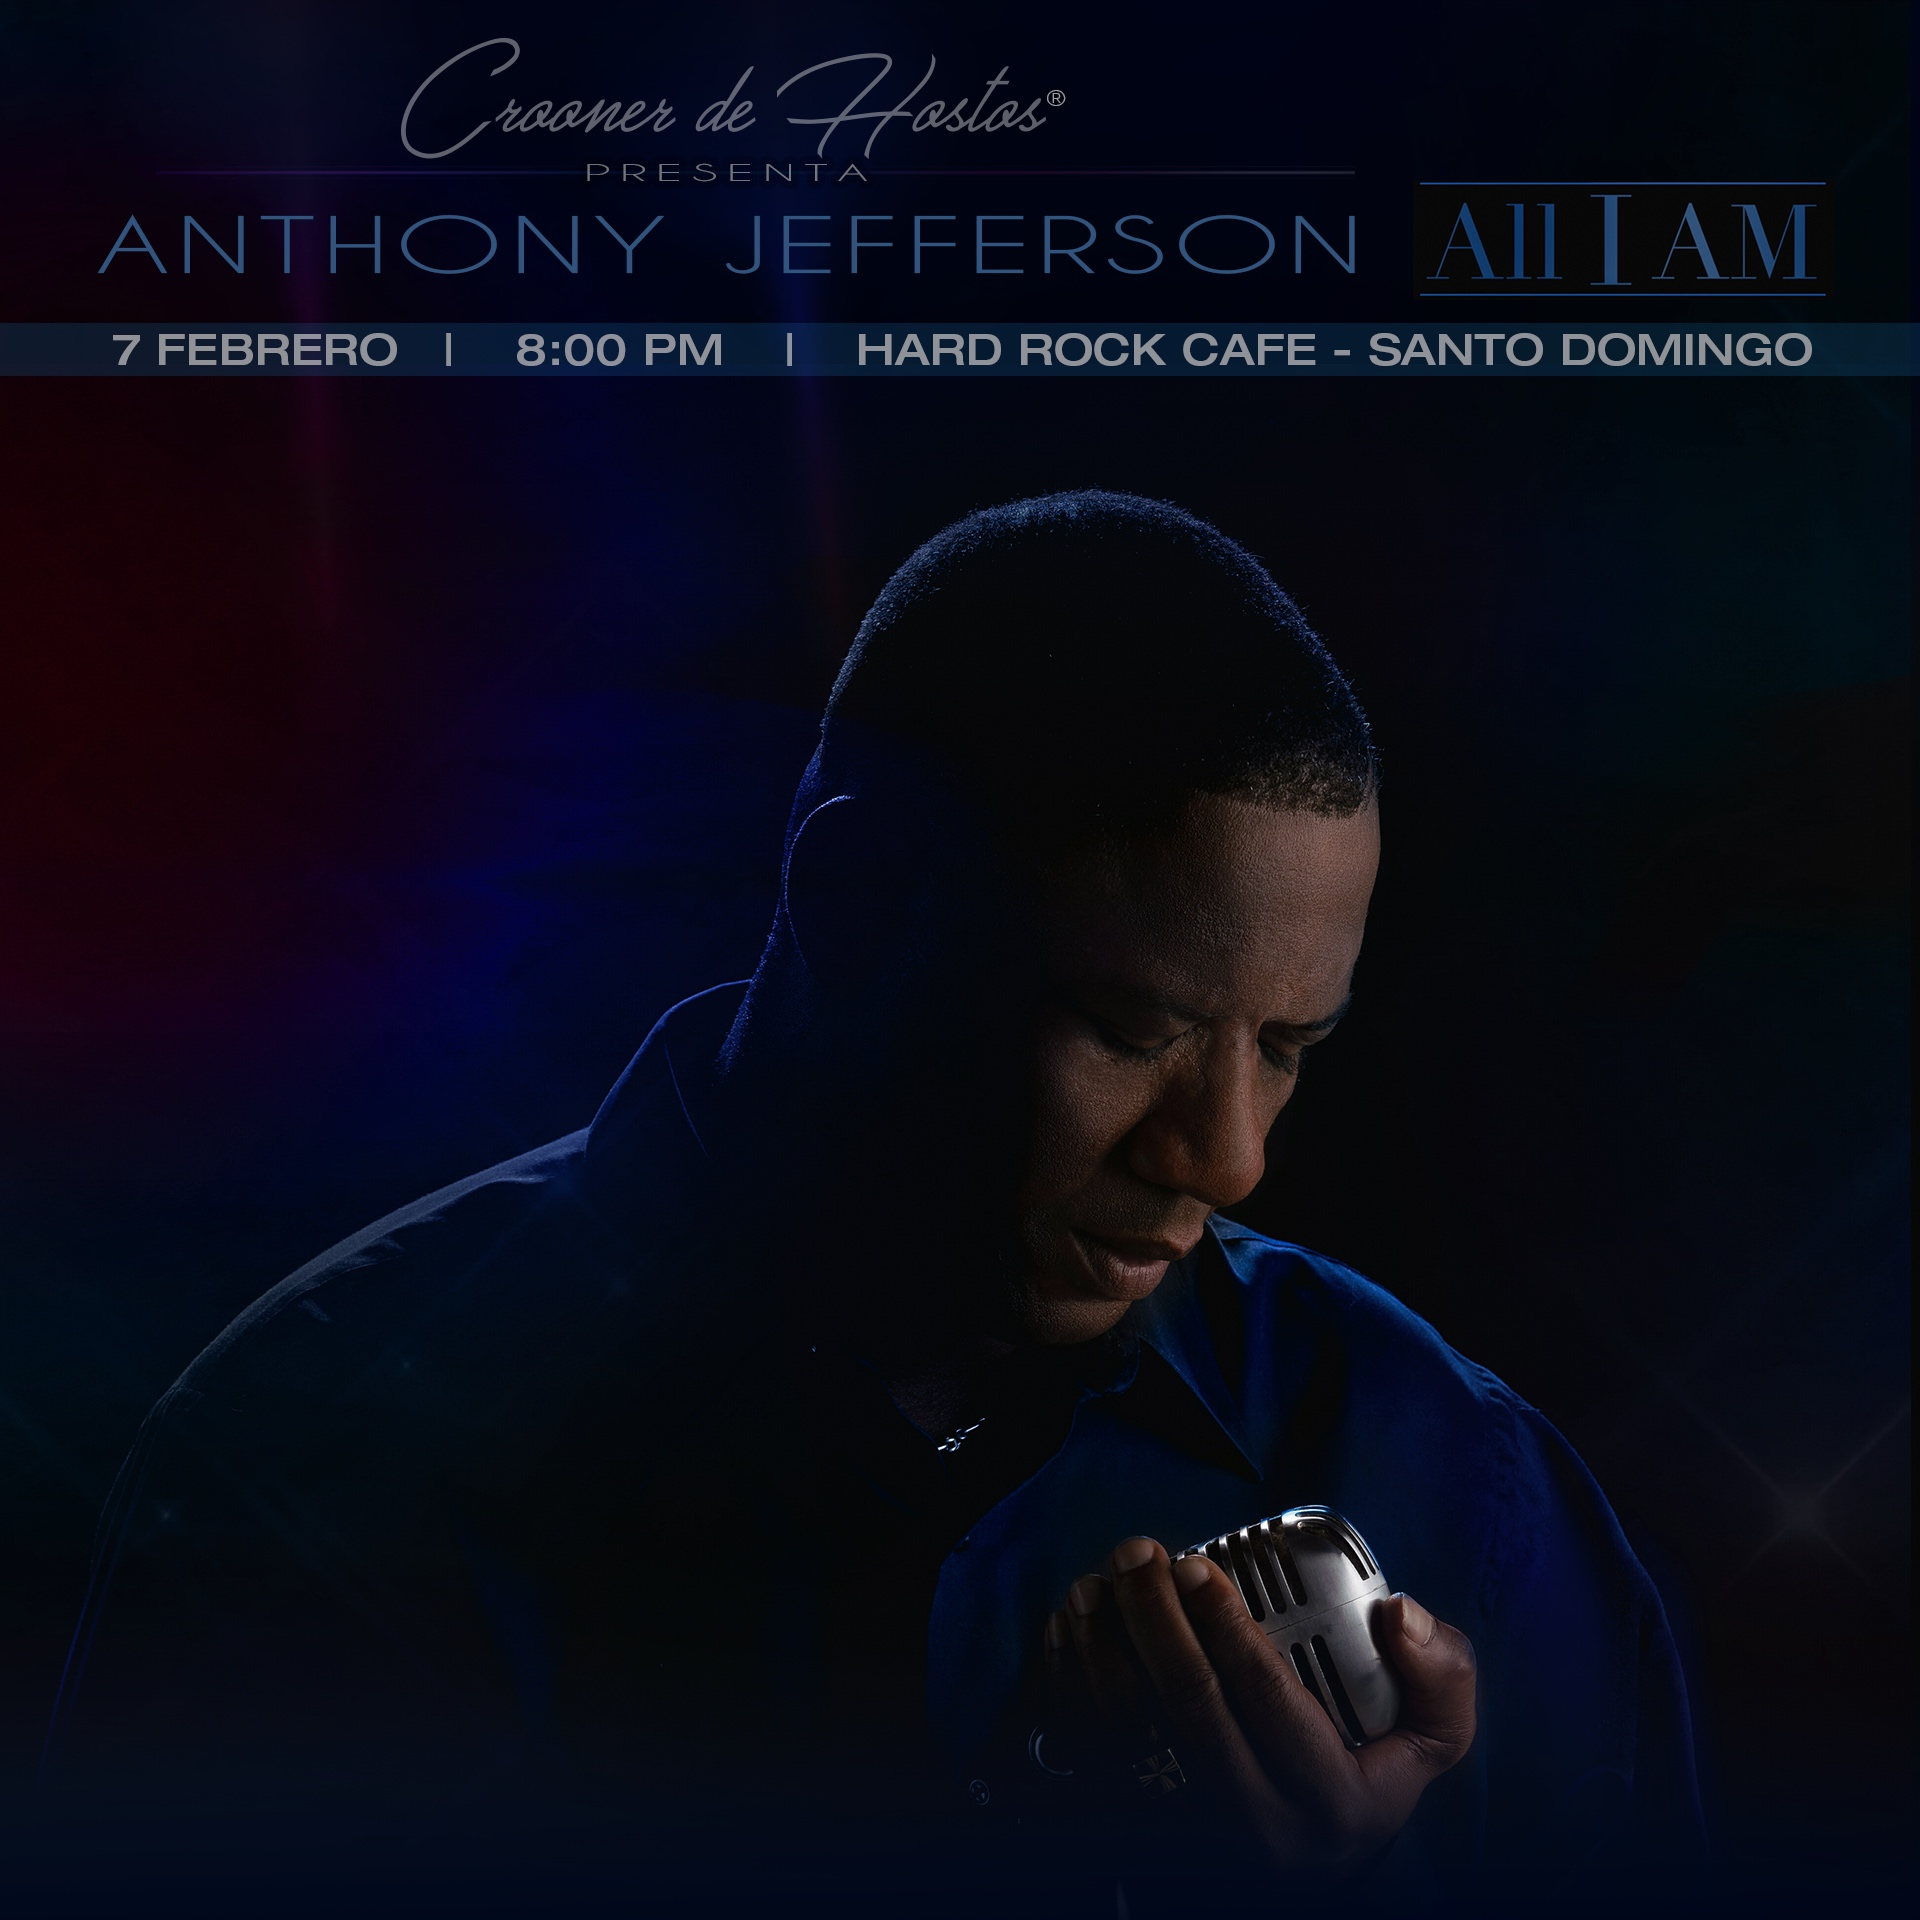 Anthony Jefferson